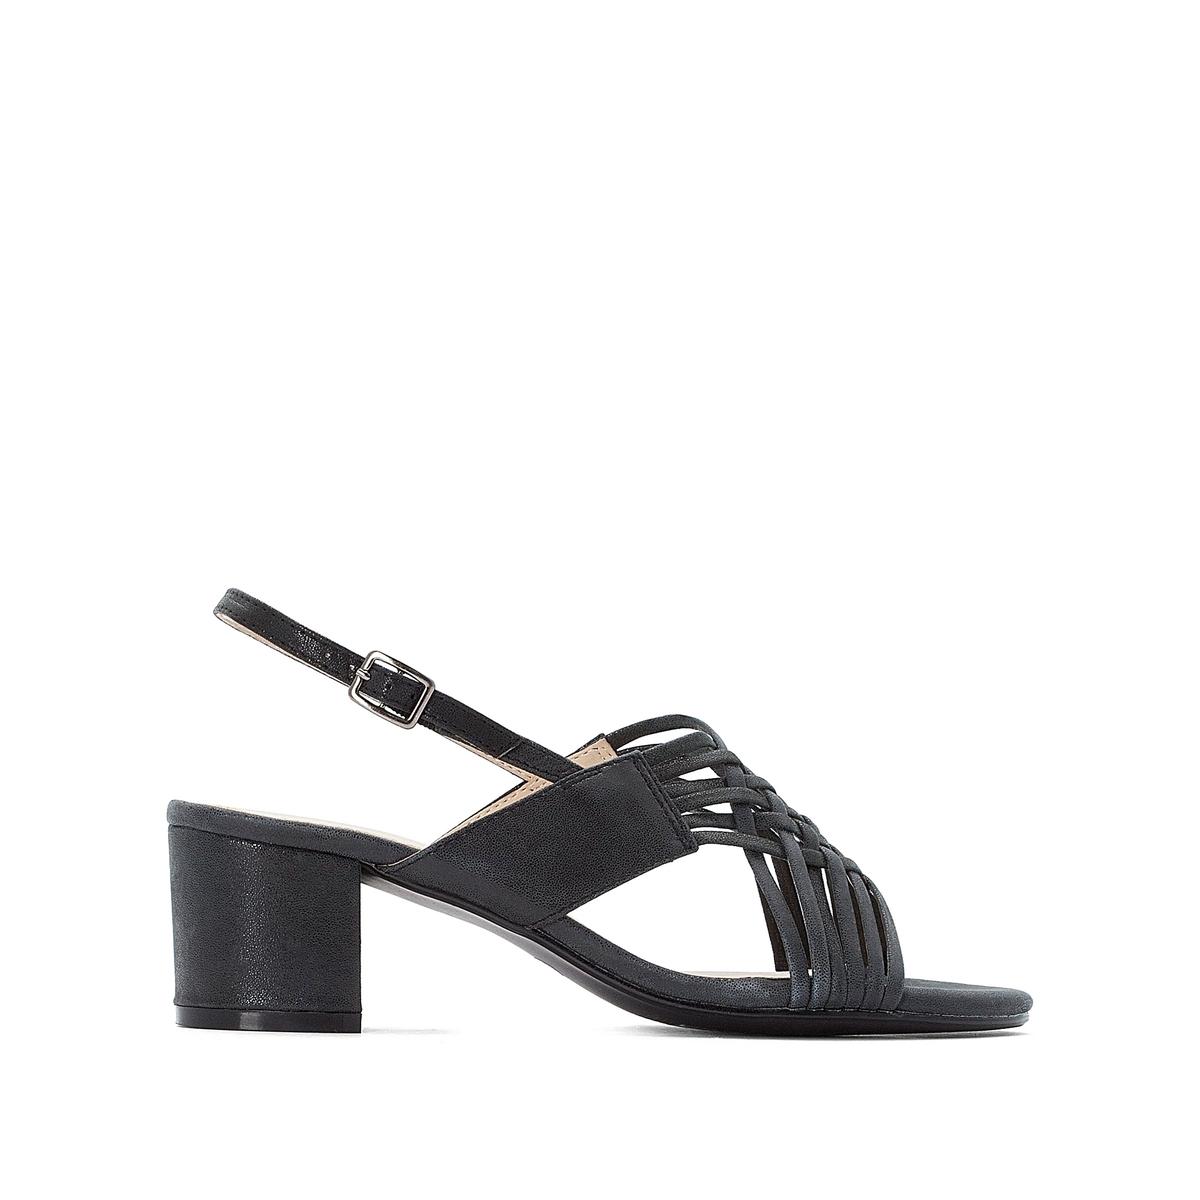 цена Босоножки La Redoute С ремешком на широком каблуке 45 серый онлайн в 2017 году